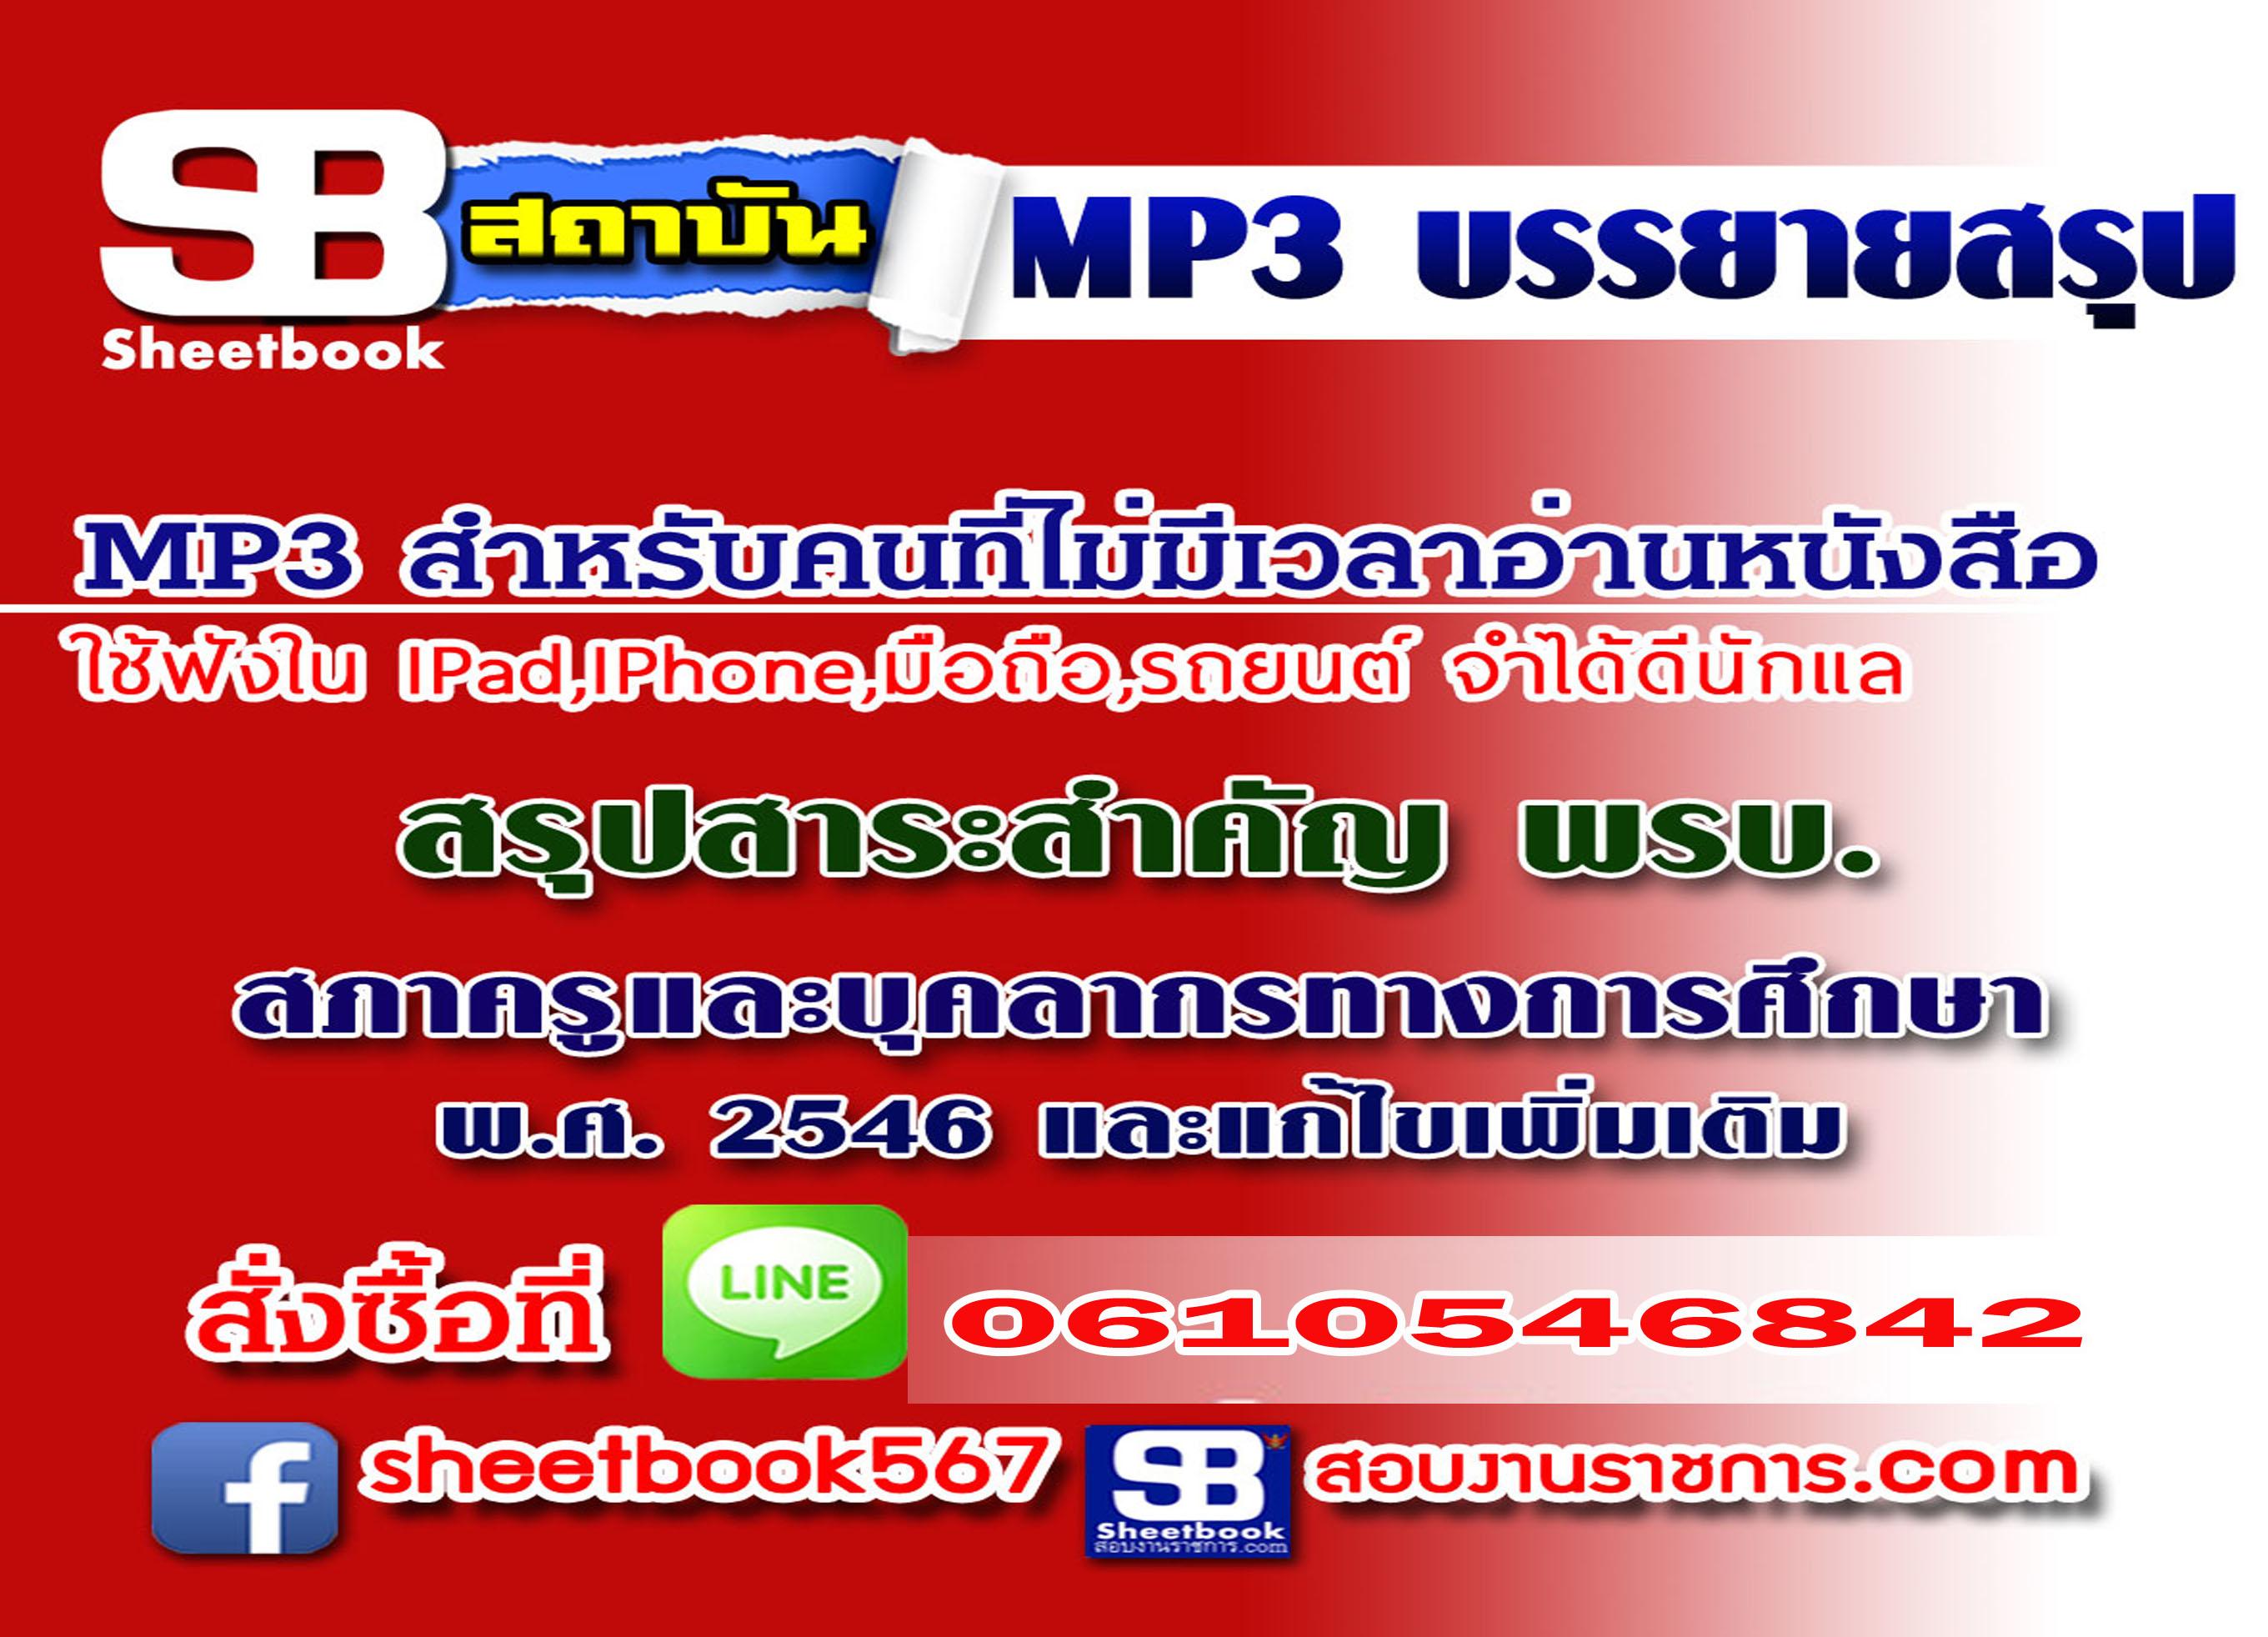 P011 - สรุปสาระสำคัญพ.ร.บ.สภาครูและบุคลากรทางการศึกษา พ.ศ.2546